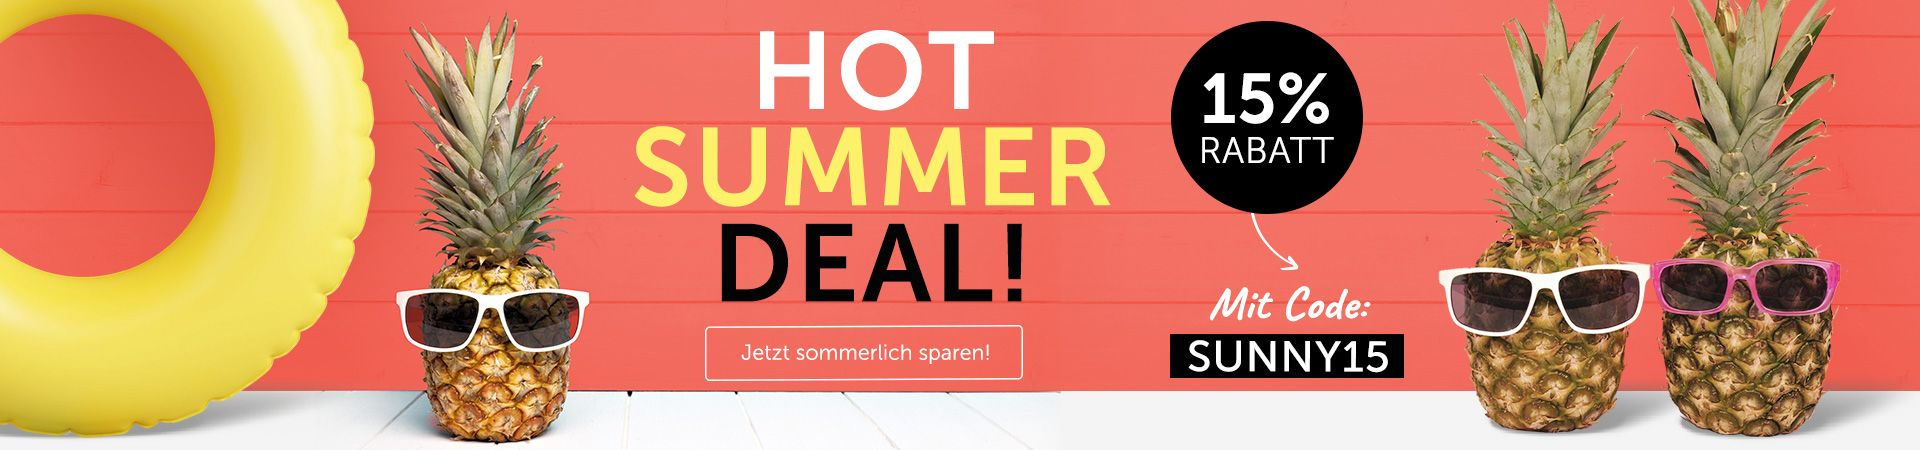 Hol dir jetzt 15% Rabatt auf Alles im Hot Summer Deal!